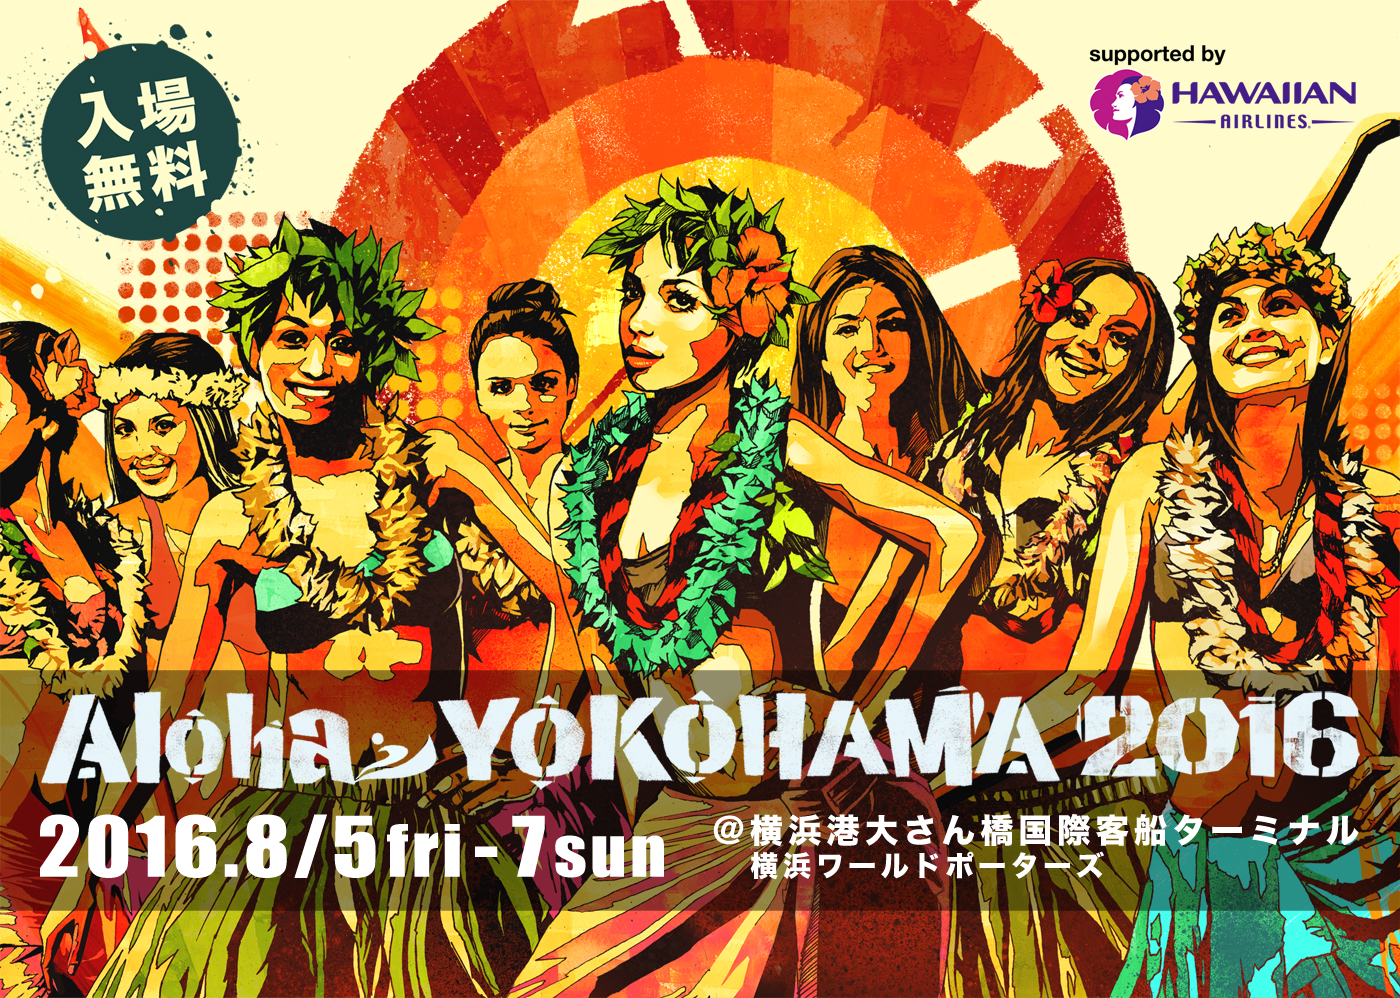 ALOHA YOKOHAMA 2016『DANG SHADES』が出展いたします。